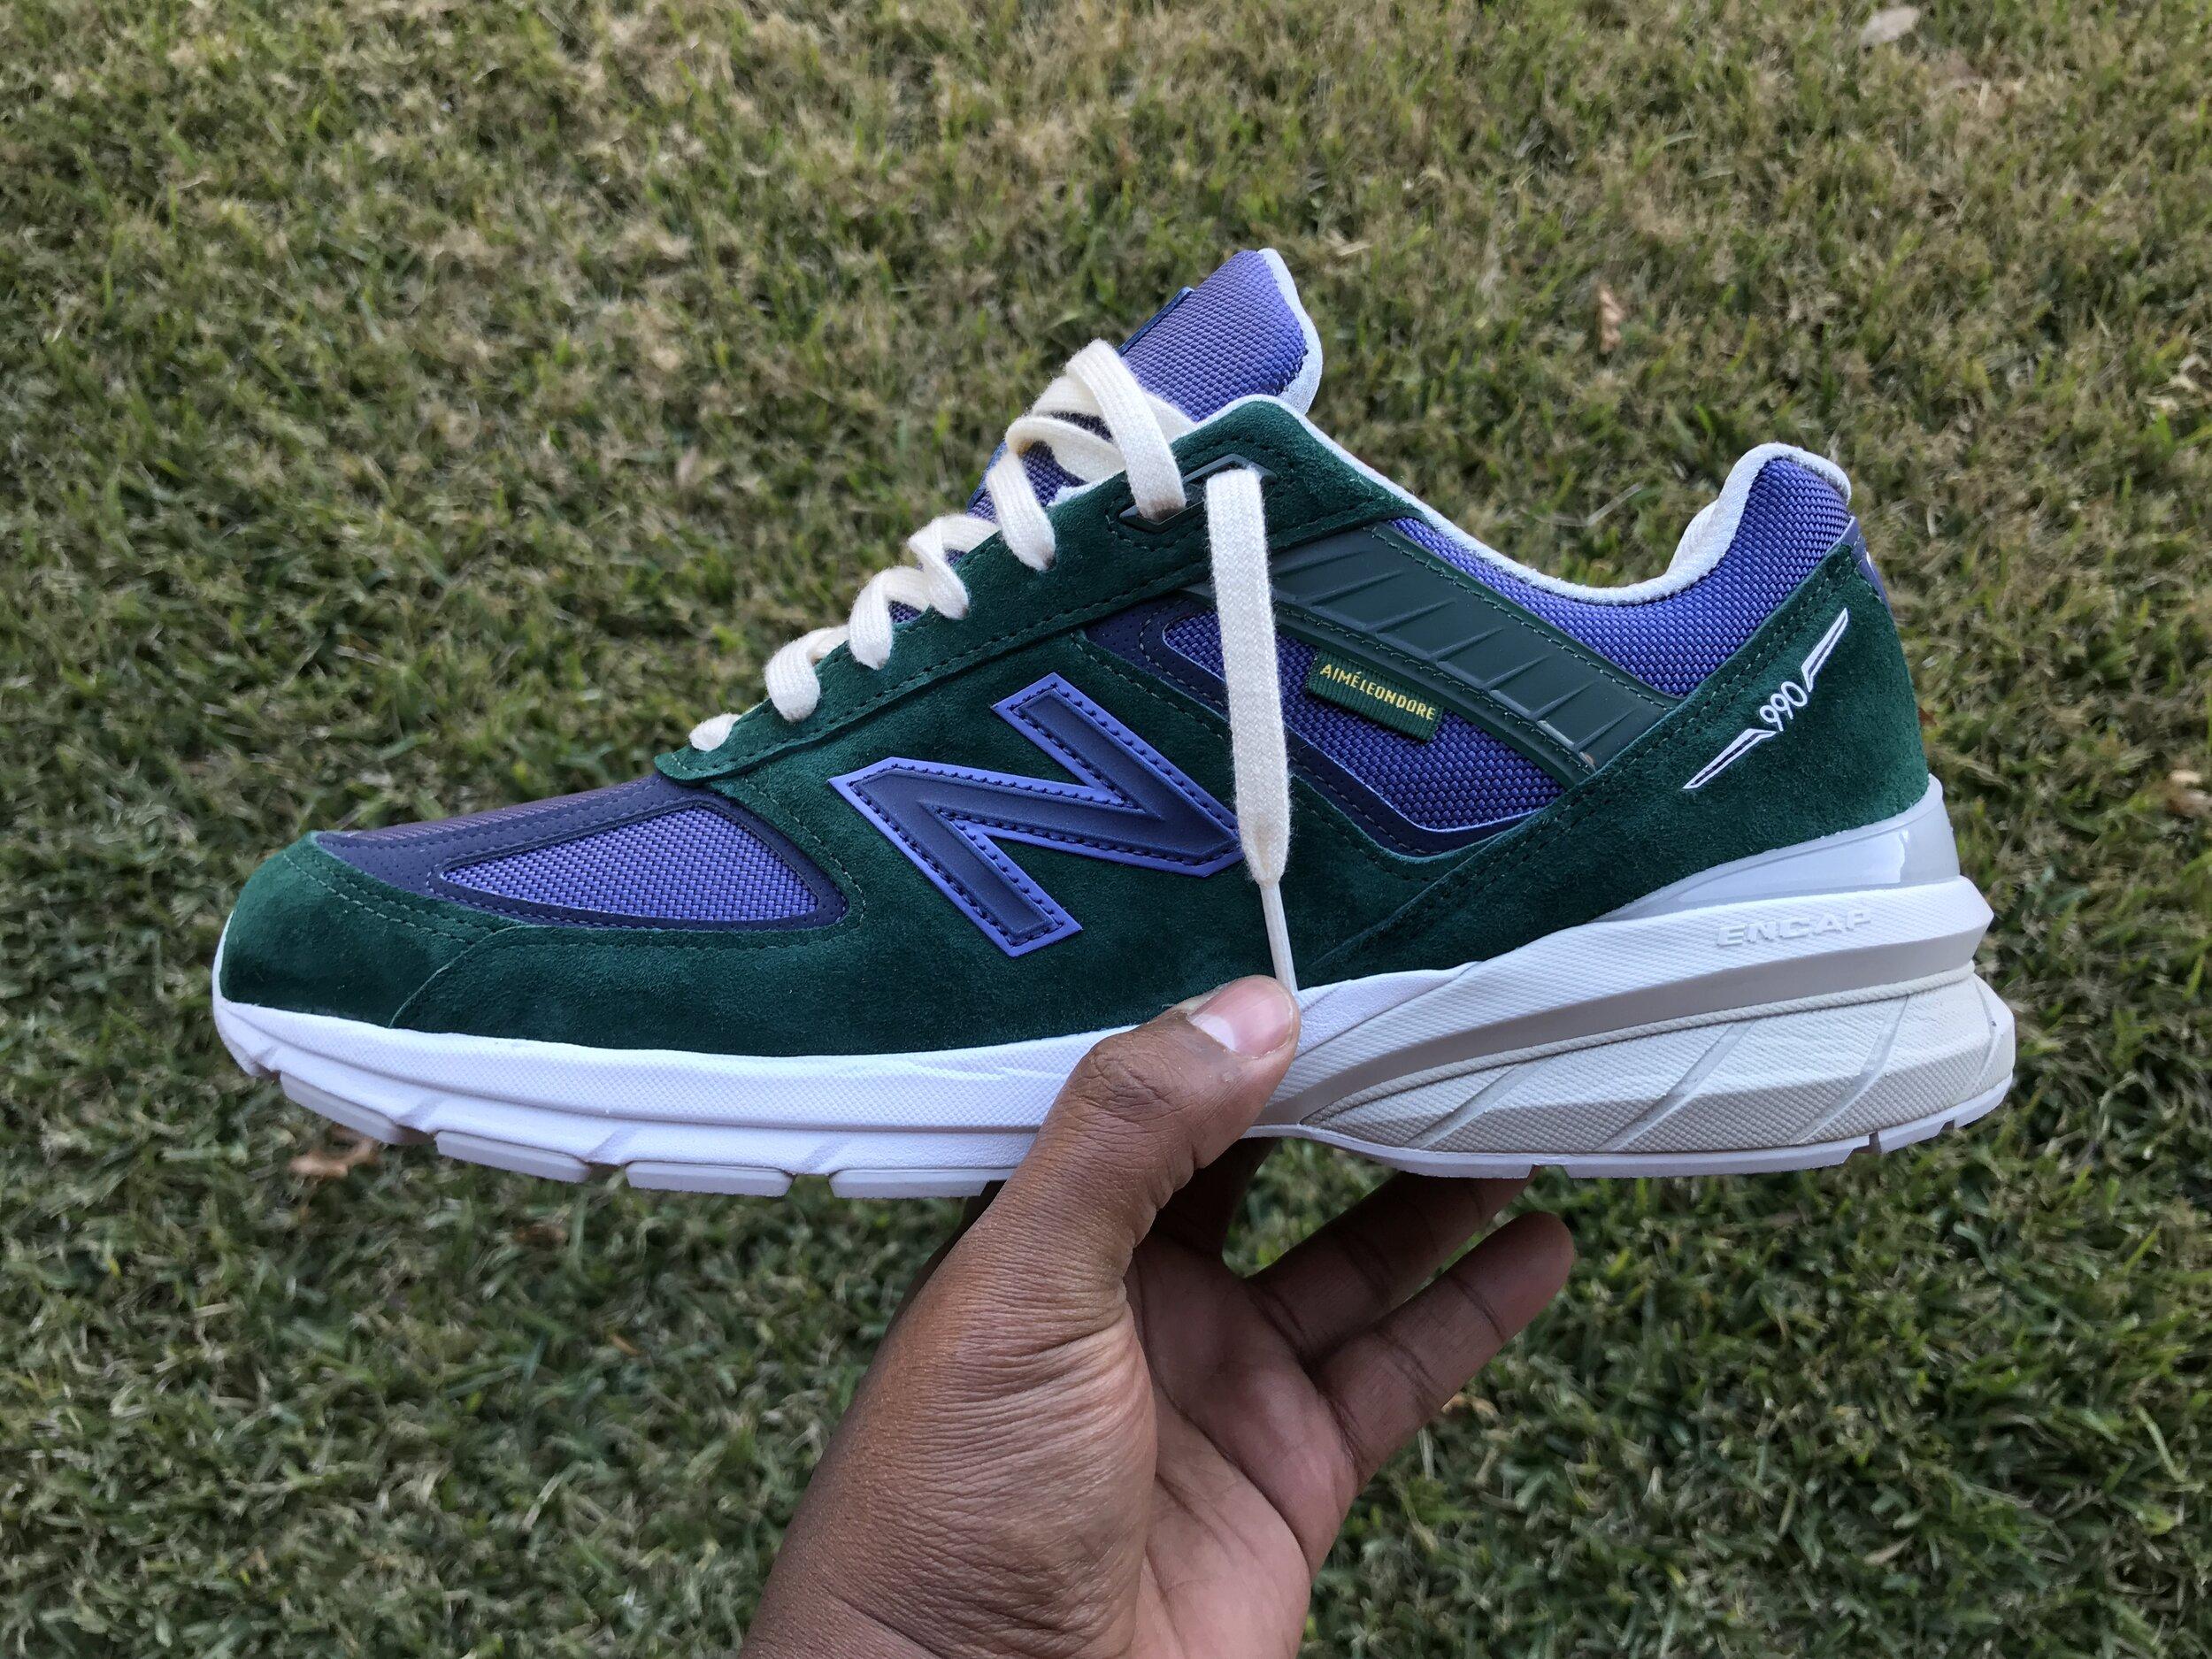 new balance 997 x 990v5